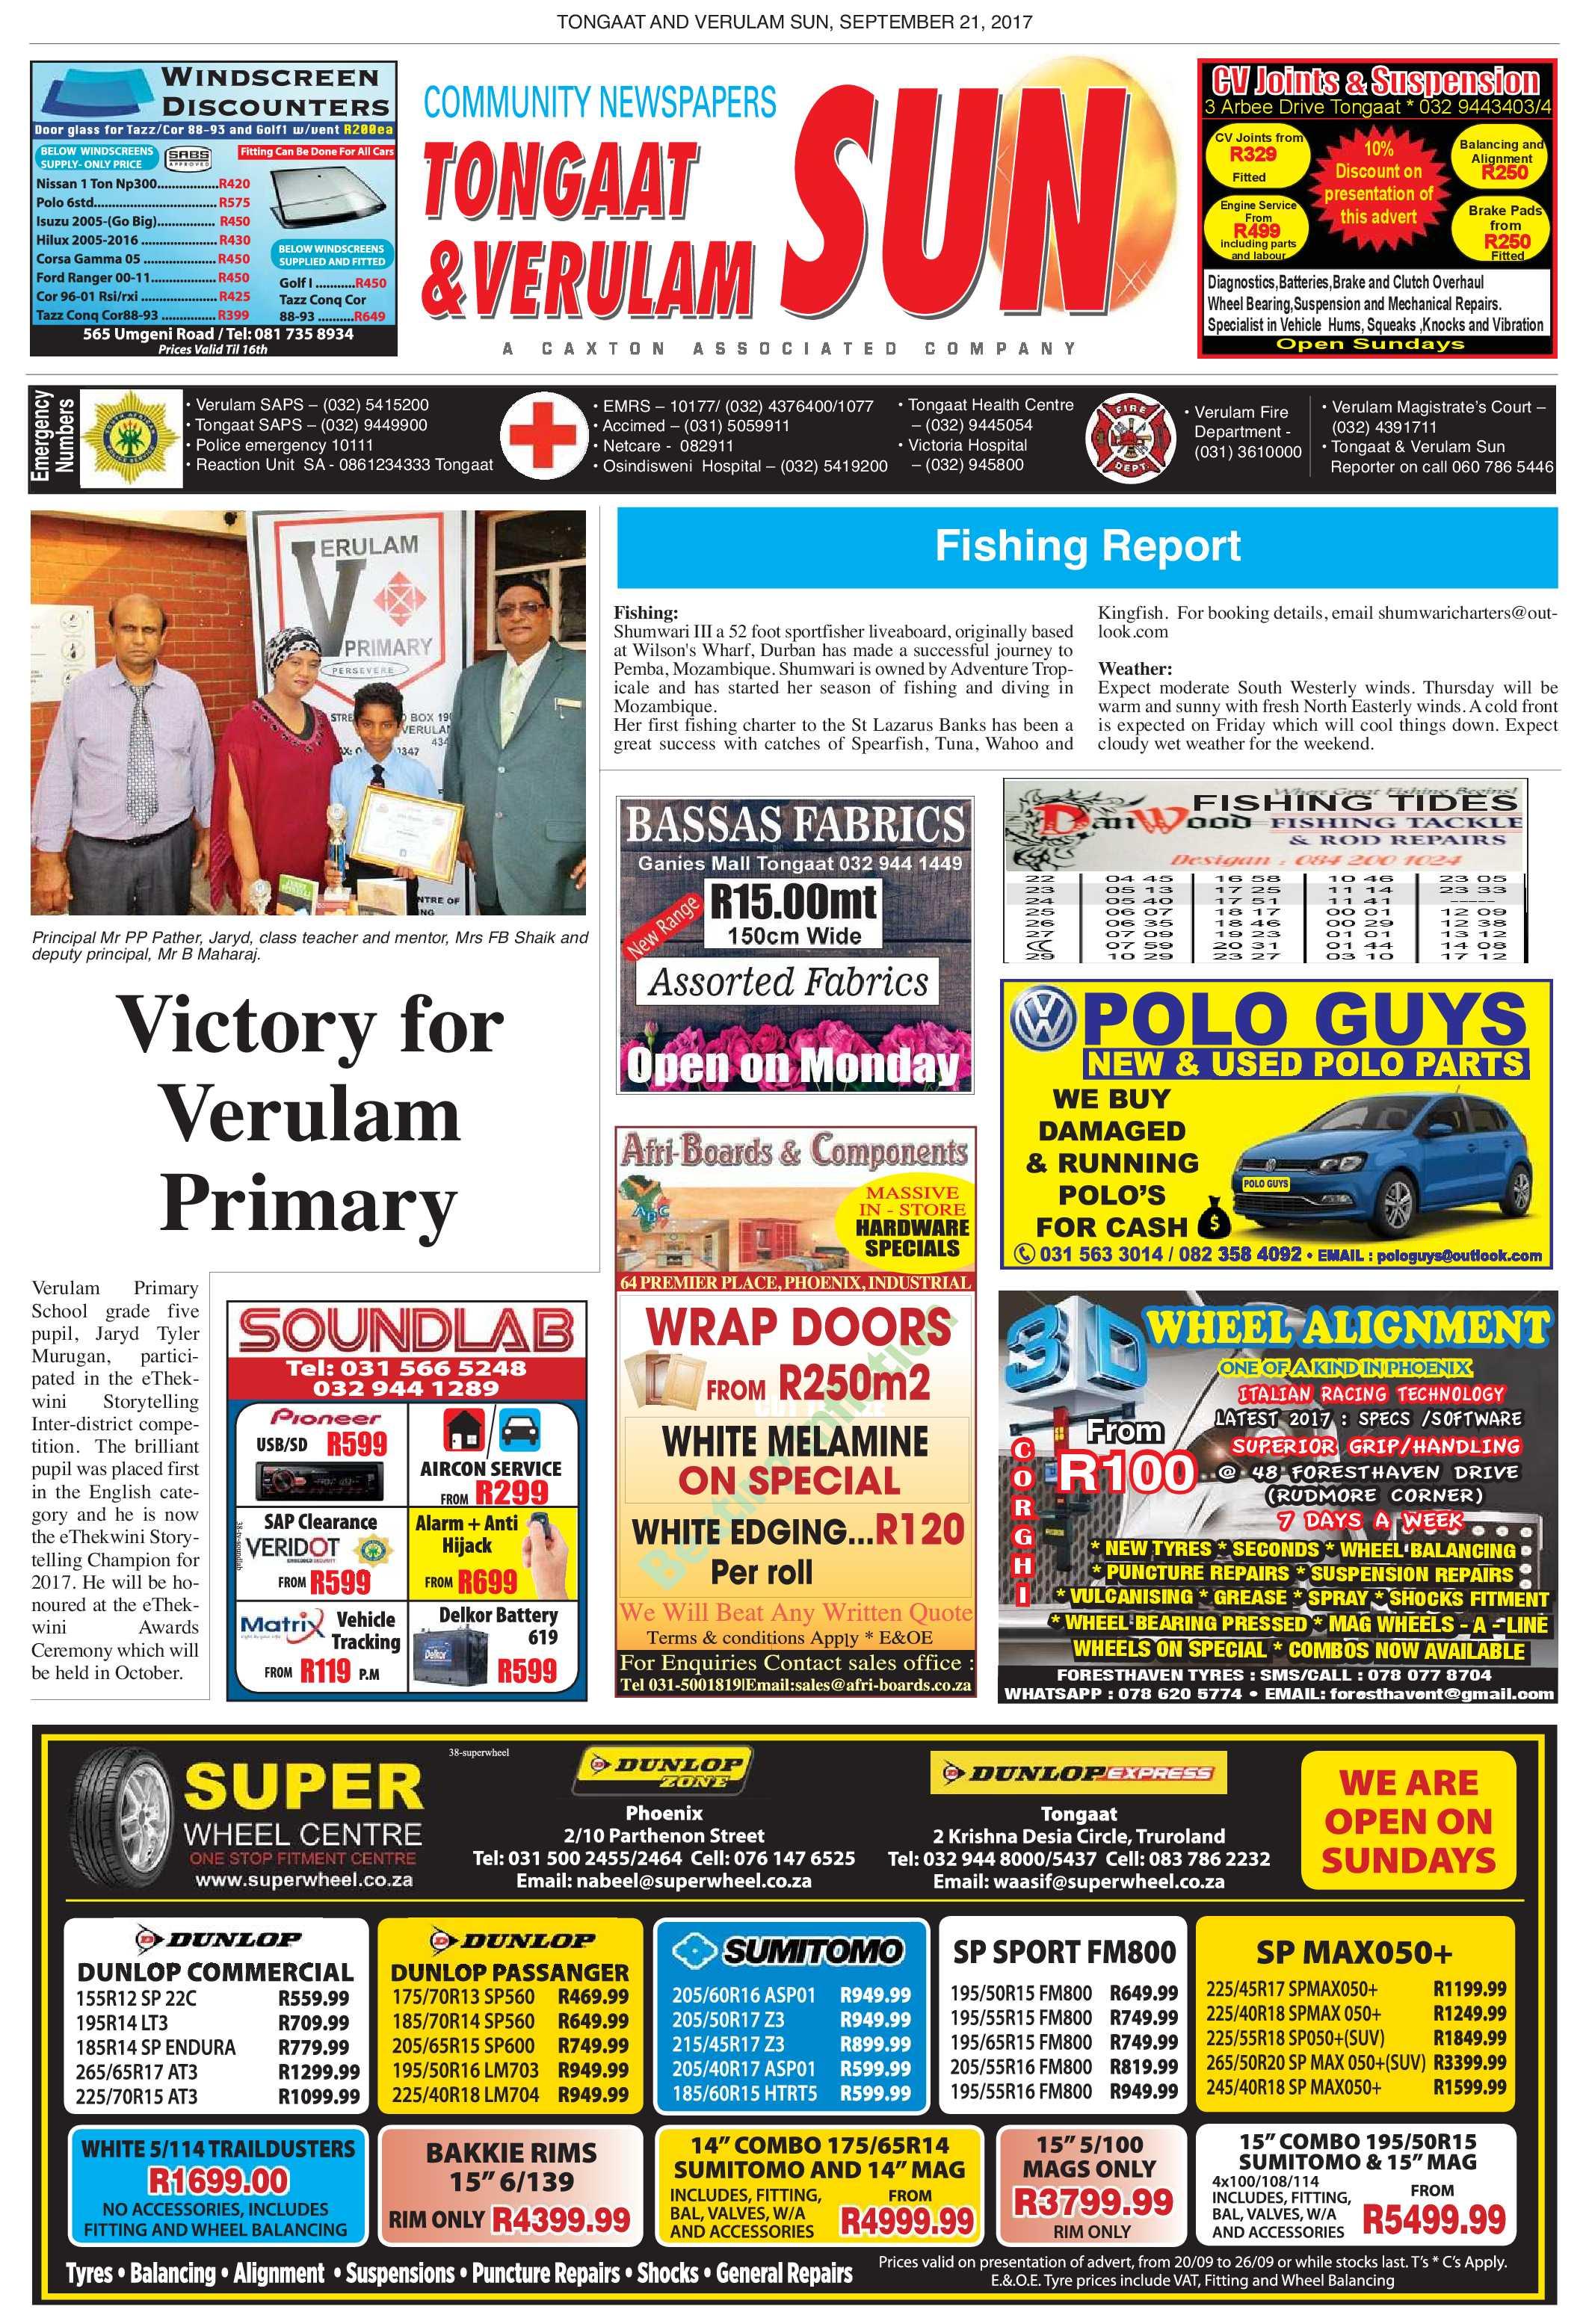 tongaat-verulam-sun-september-21-epapers-page-12